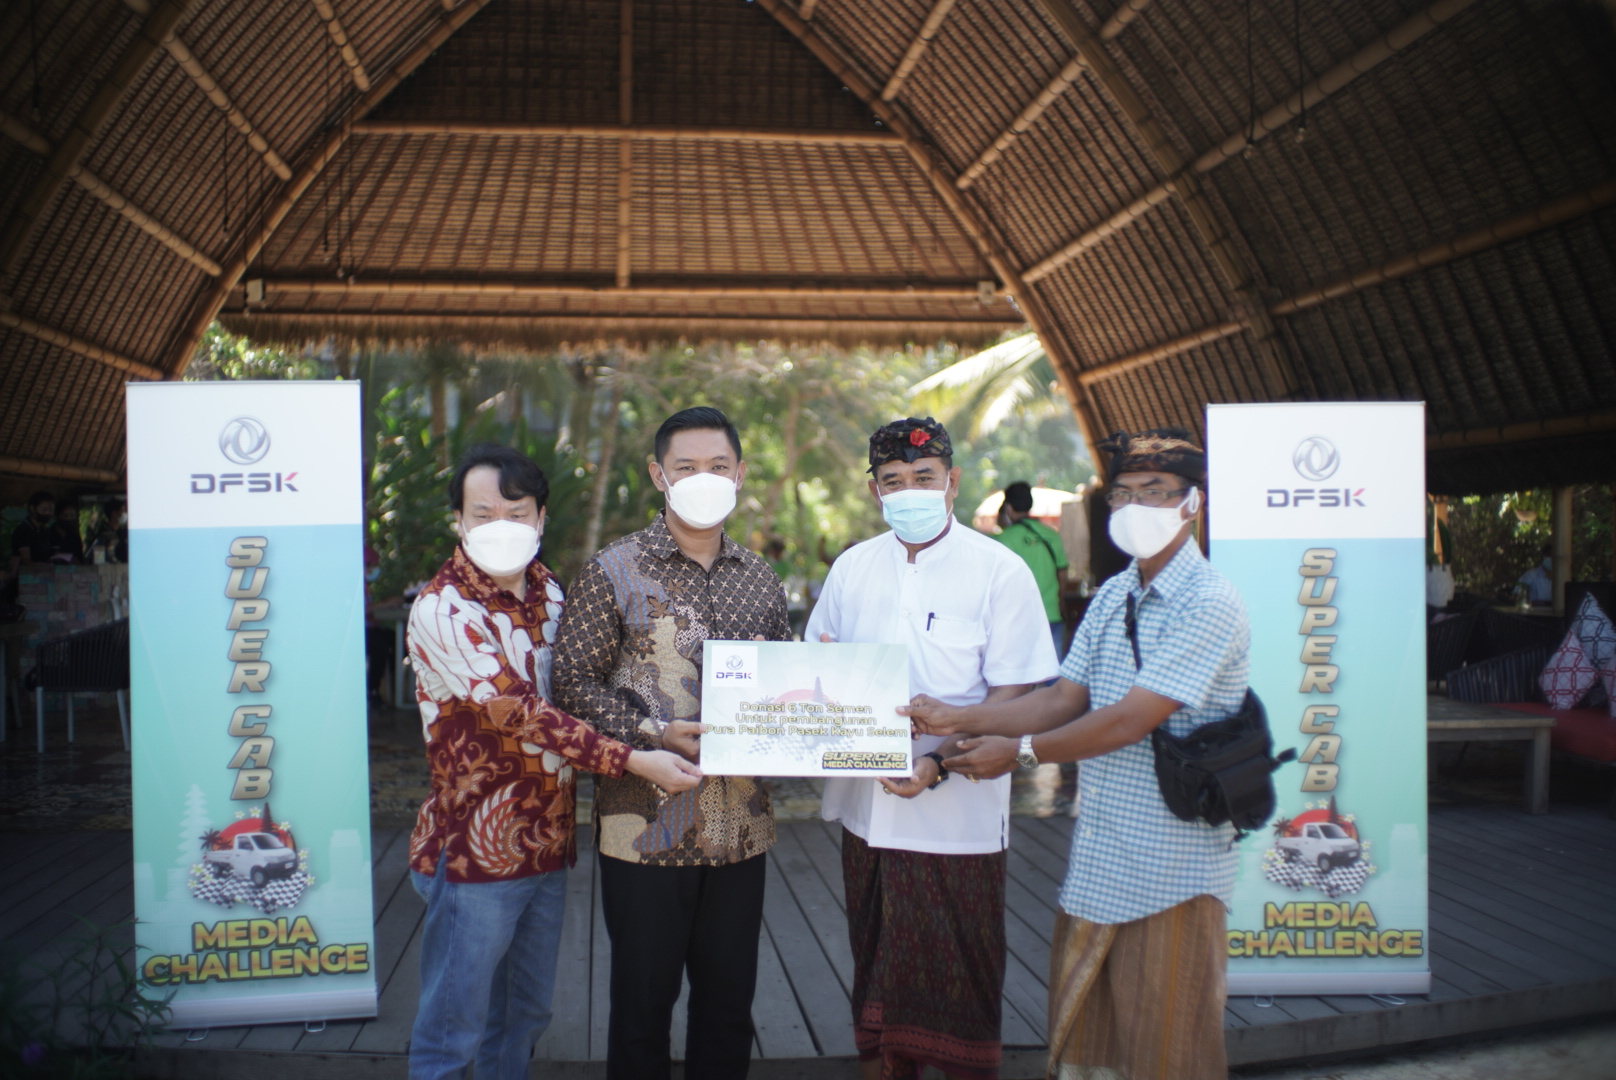 PENYERAHAN simbolis CSR DFSK berupa 6 ton semen untuk pembangunan Pura Paibon Pasek Kayu Selem, Desa Besan, Kecamatan Dawan, Klungkung, usai kegiatan media challenge, Sabtu (19/6/2021). Foto: rap